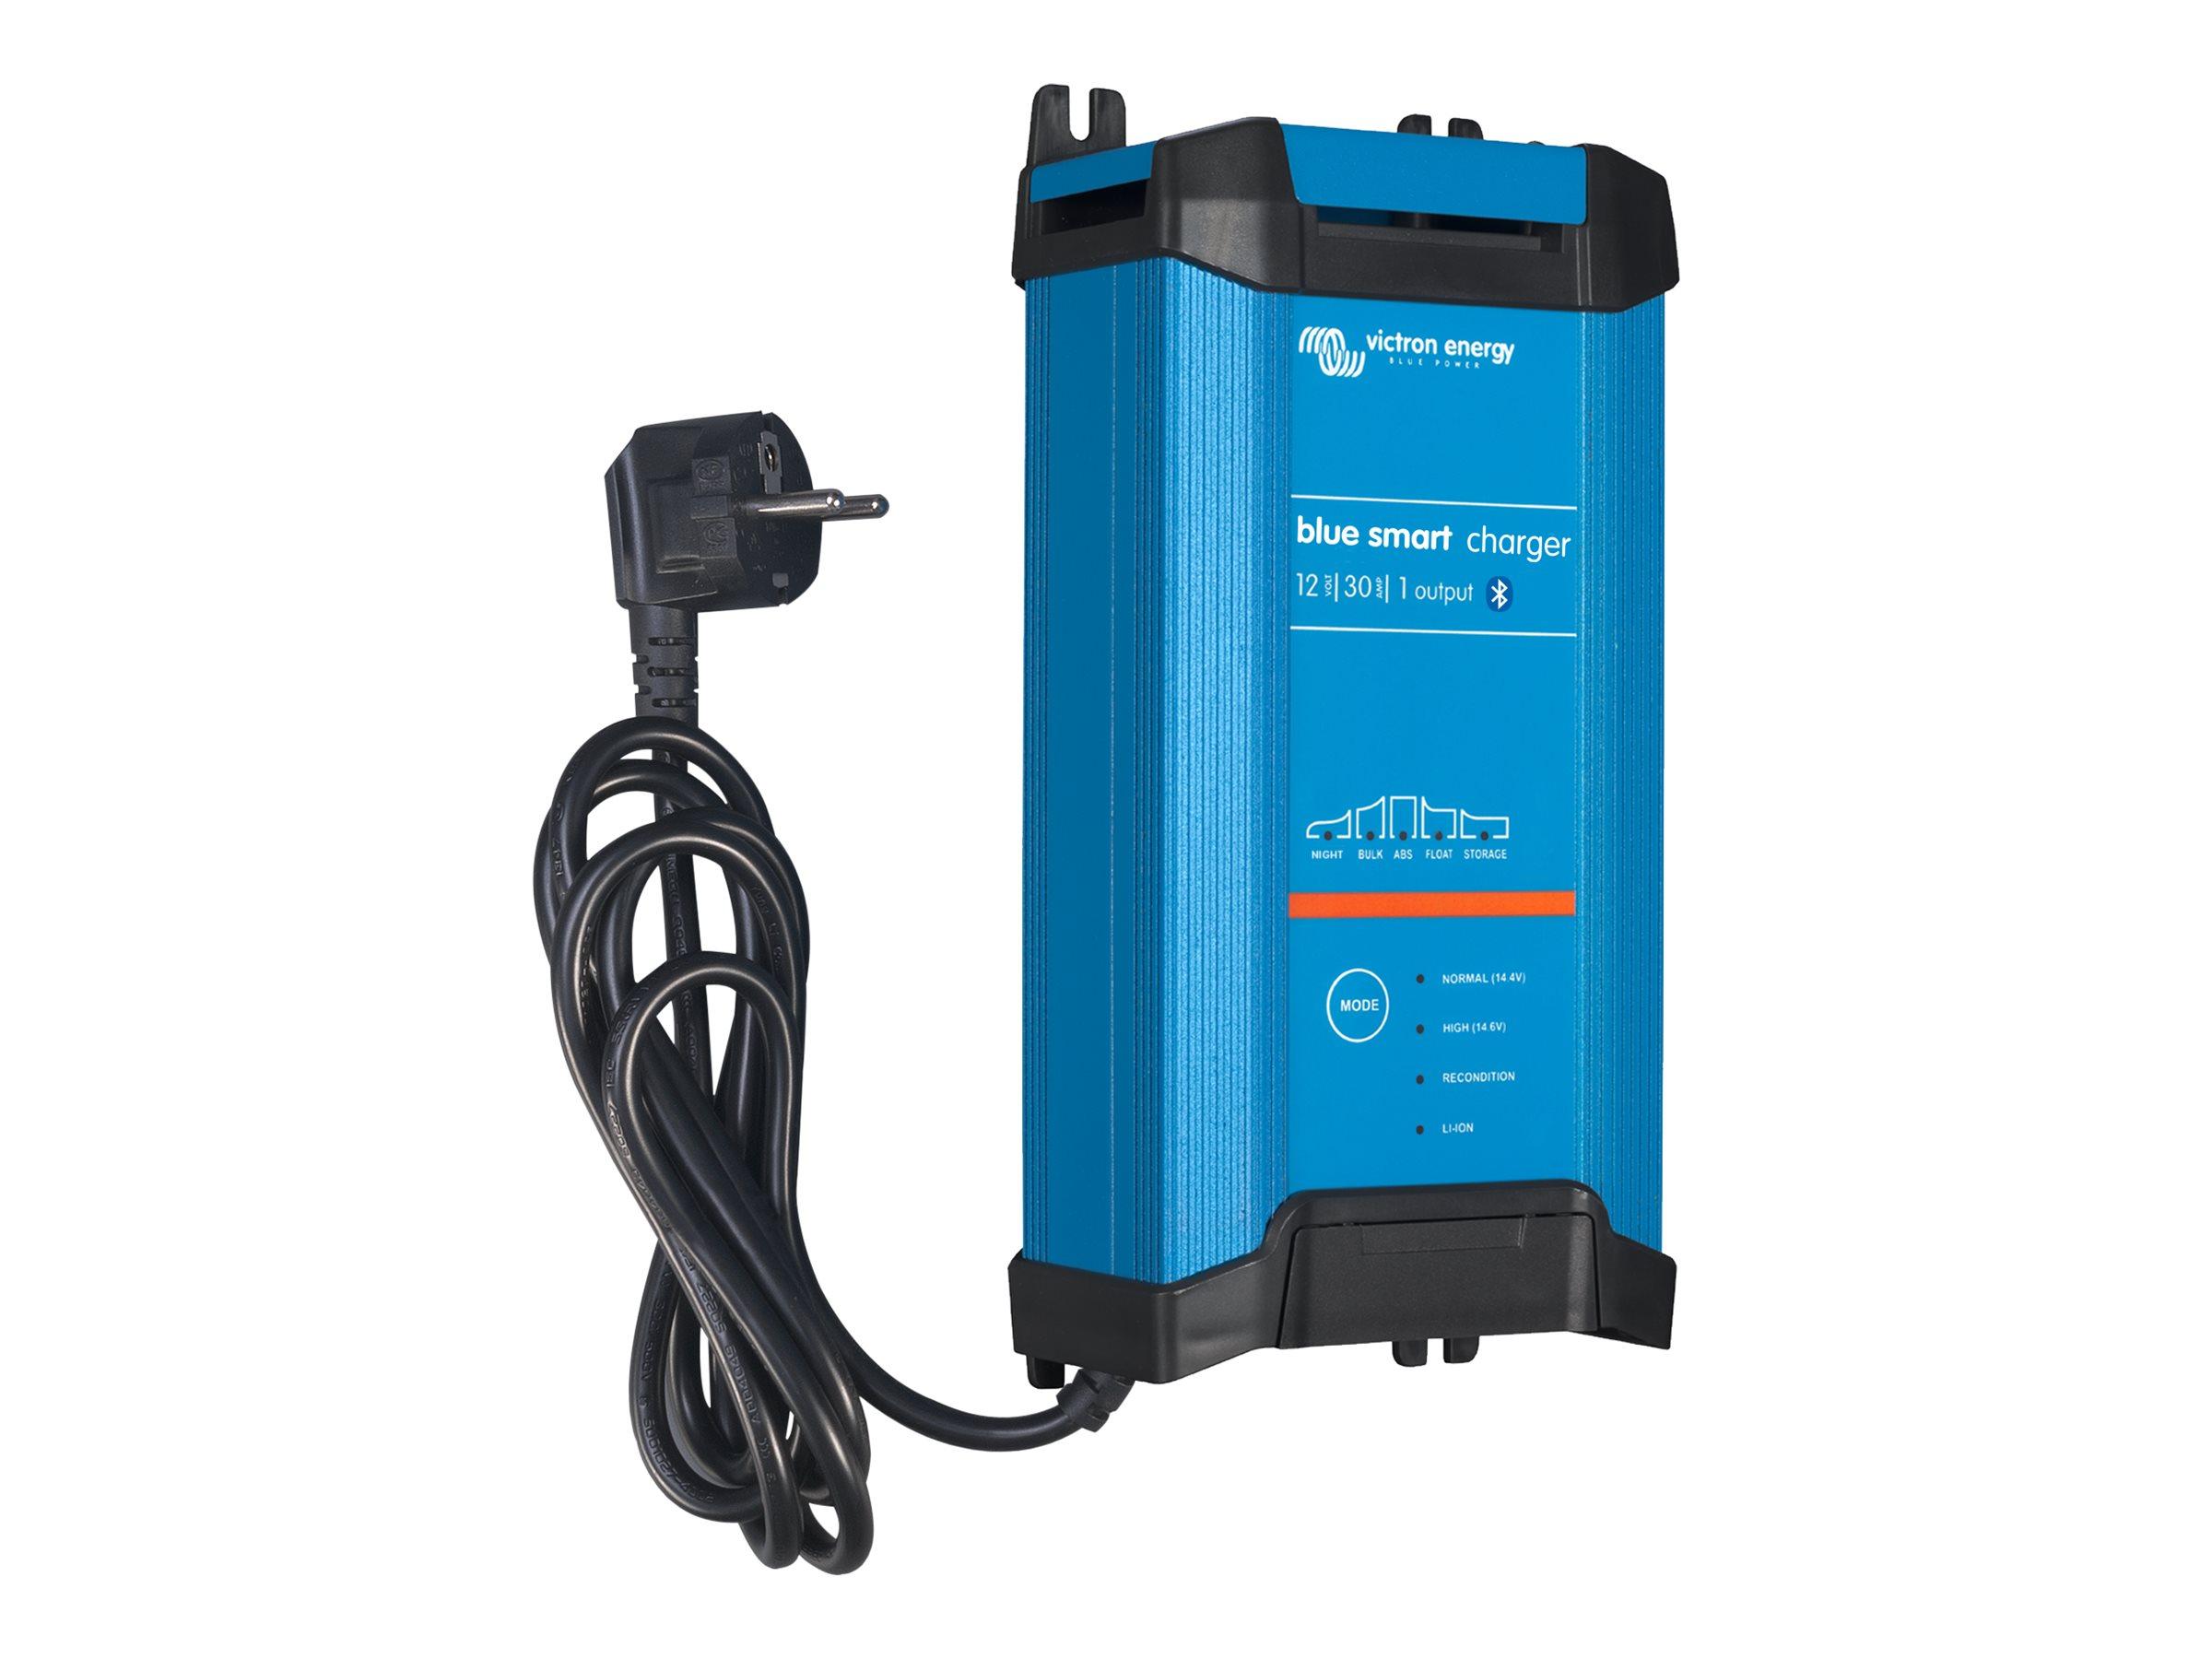 Victron Energy Blue Smart IP22 Charger 12/30 - Batterieladegerät - AC 180-265 V - Ausgangsanschlüsse: 1 - Blau, RAL 5012